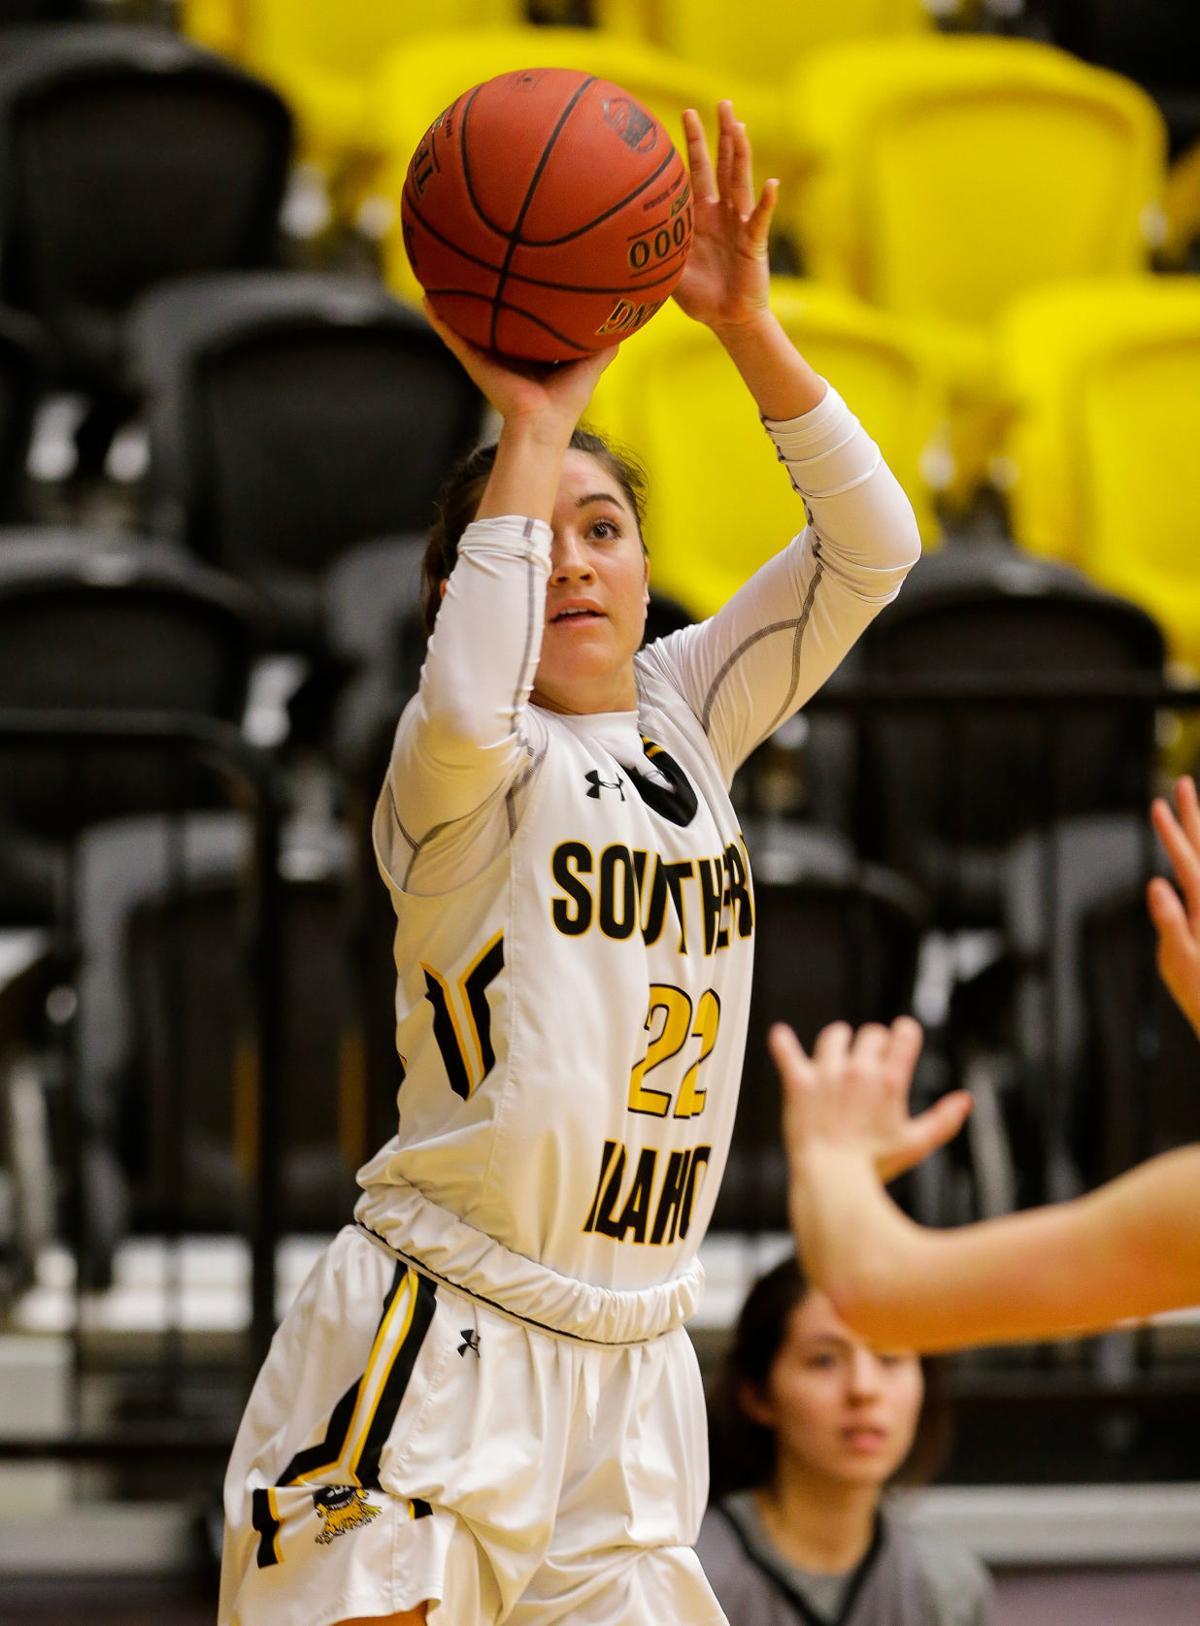 Women's basketball: CNCC at CSI